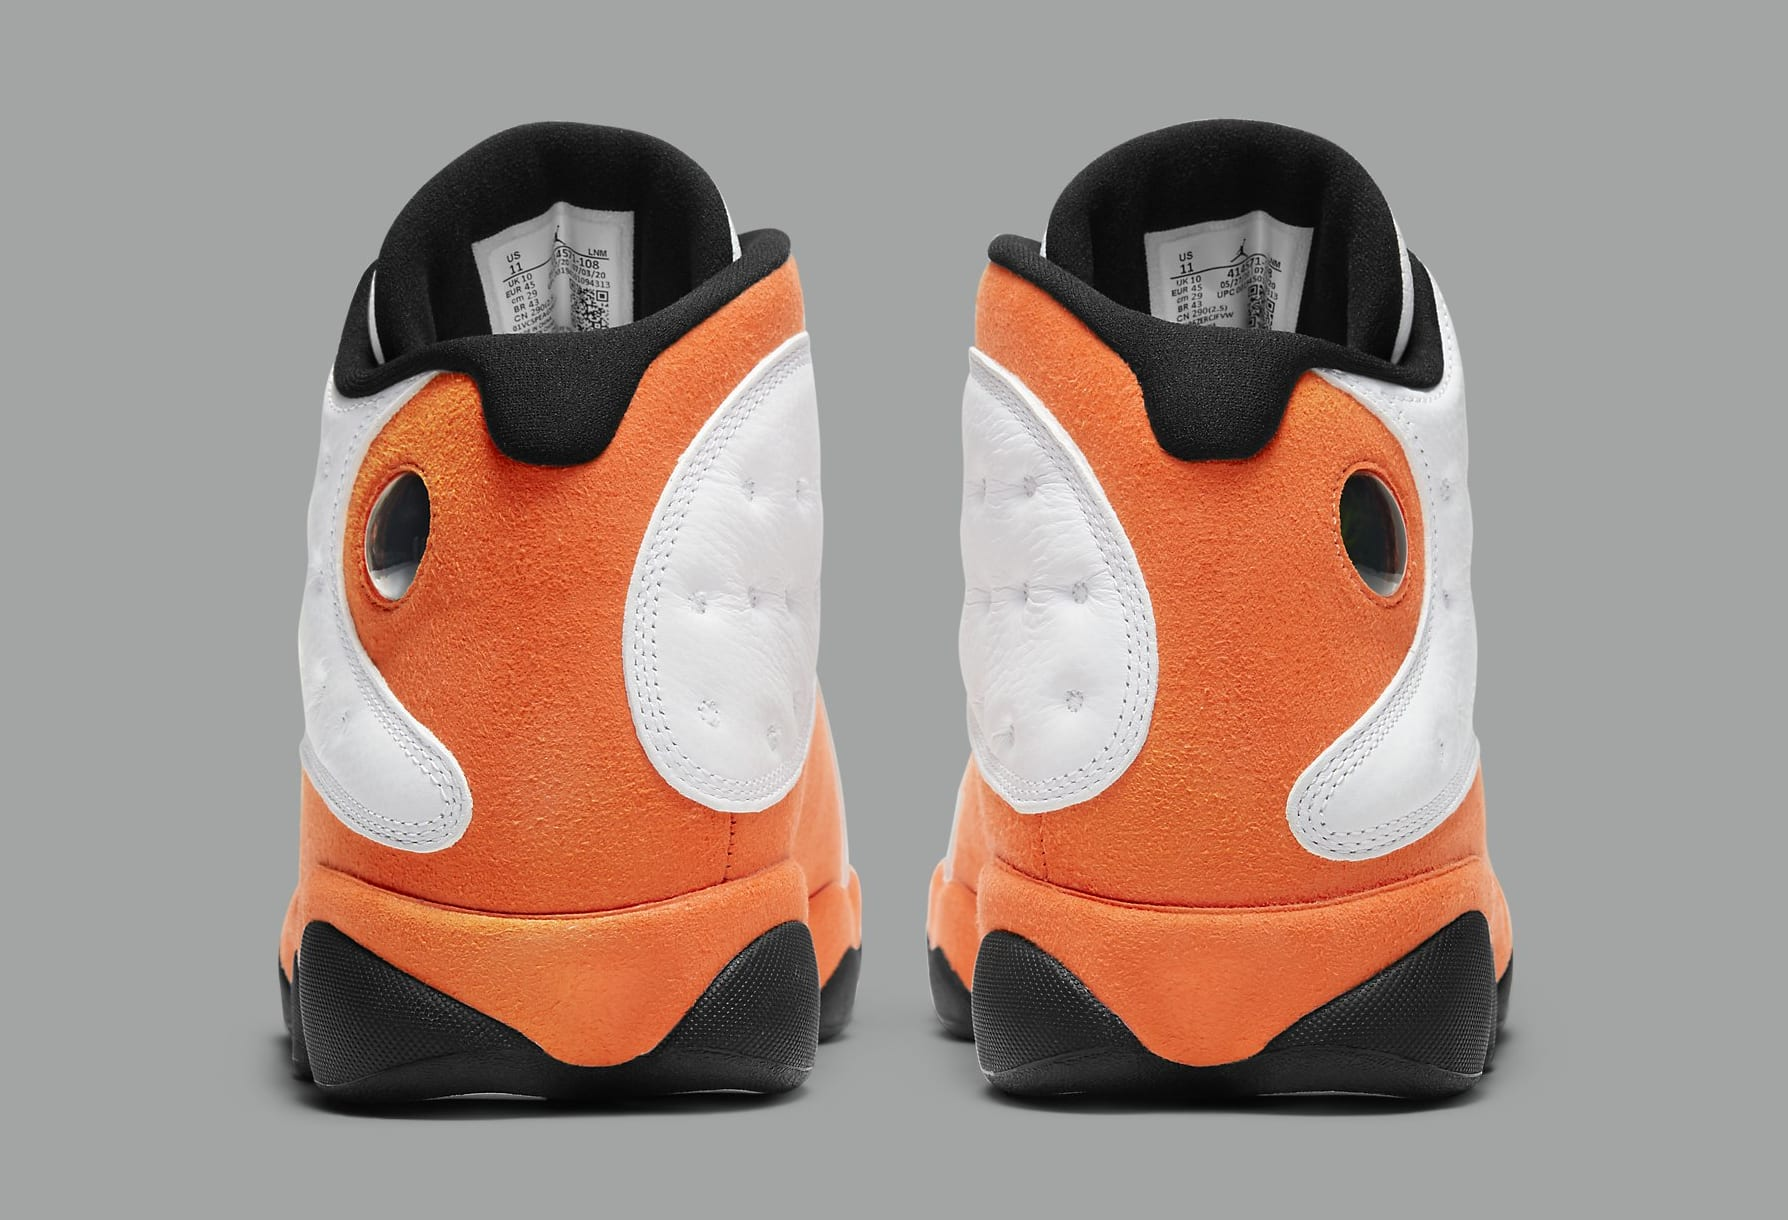 Air Jordan 13 Retro 'Starfish' 414571-108 Heel